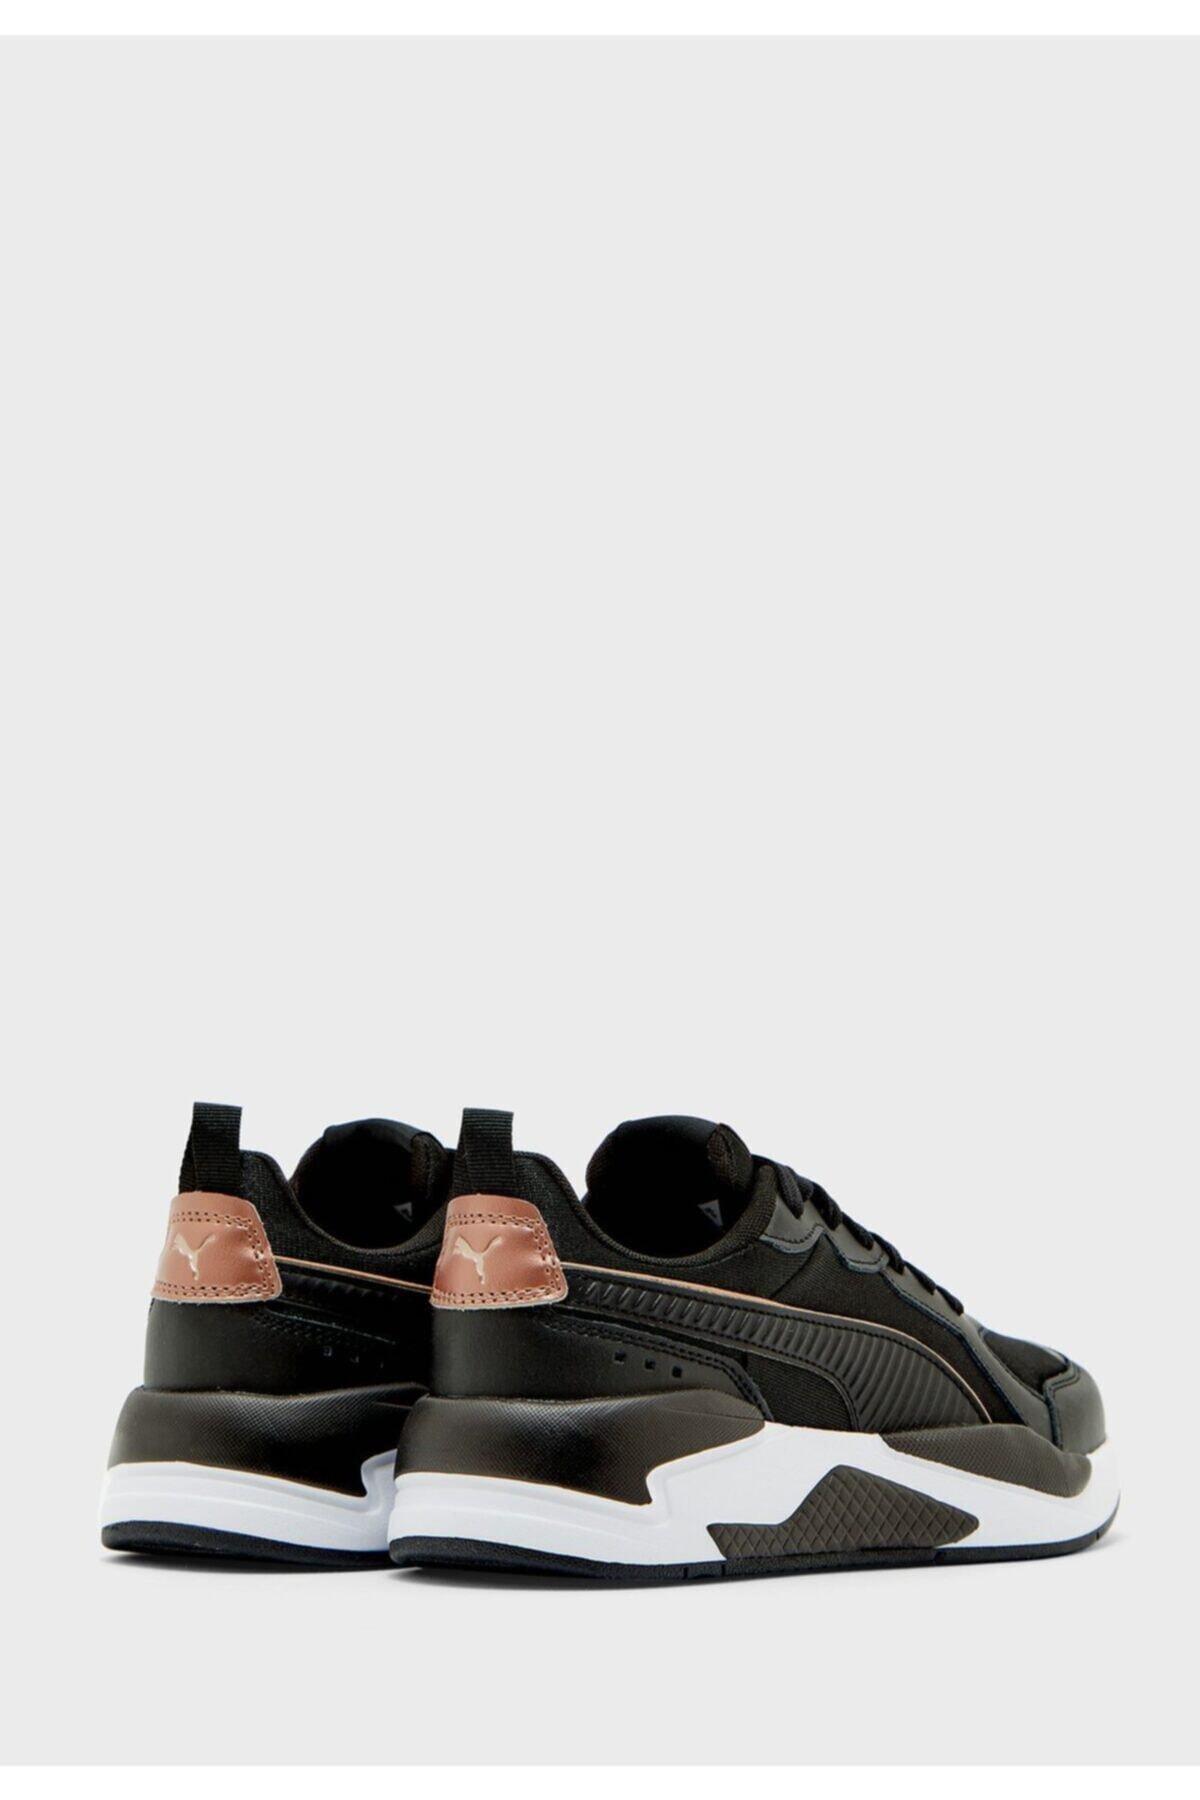 Puma X-RAY METALLIC WN S PUMA Siyah Kadın Sneaker Ayakkabı 101085468 2